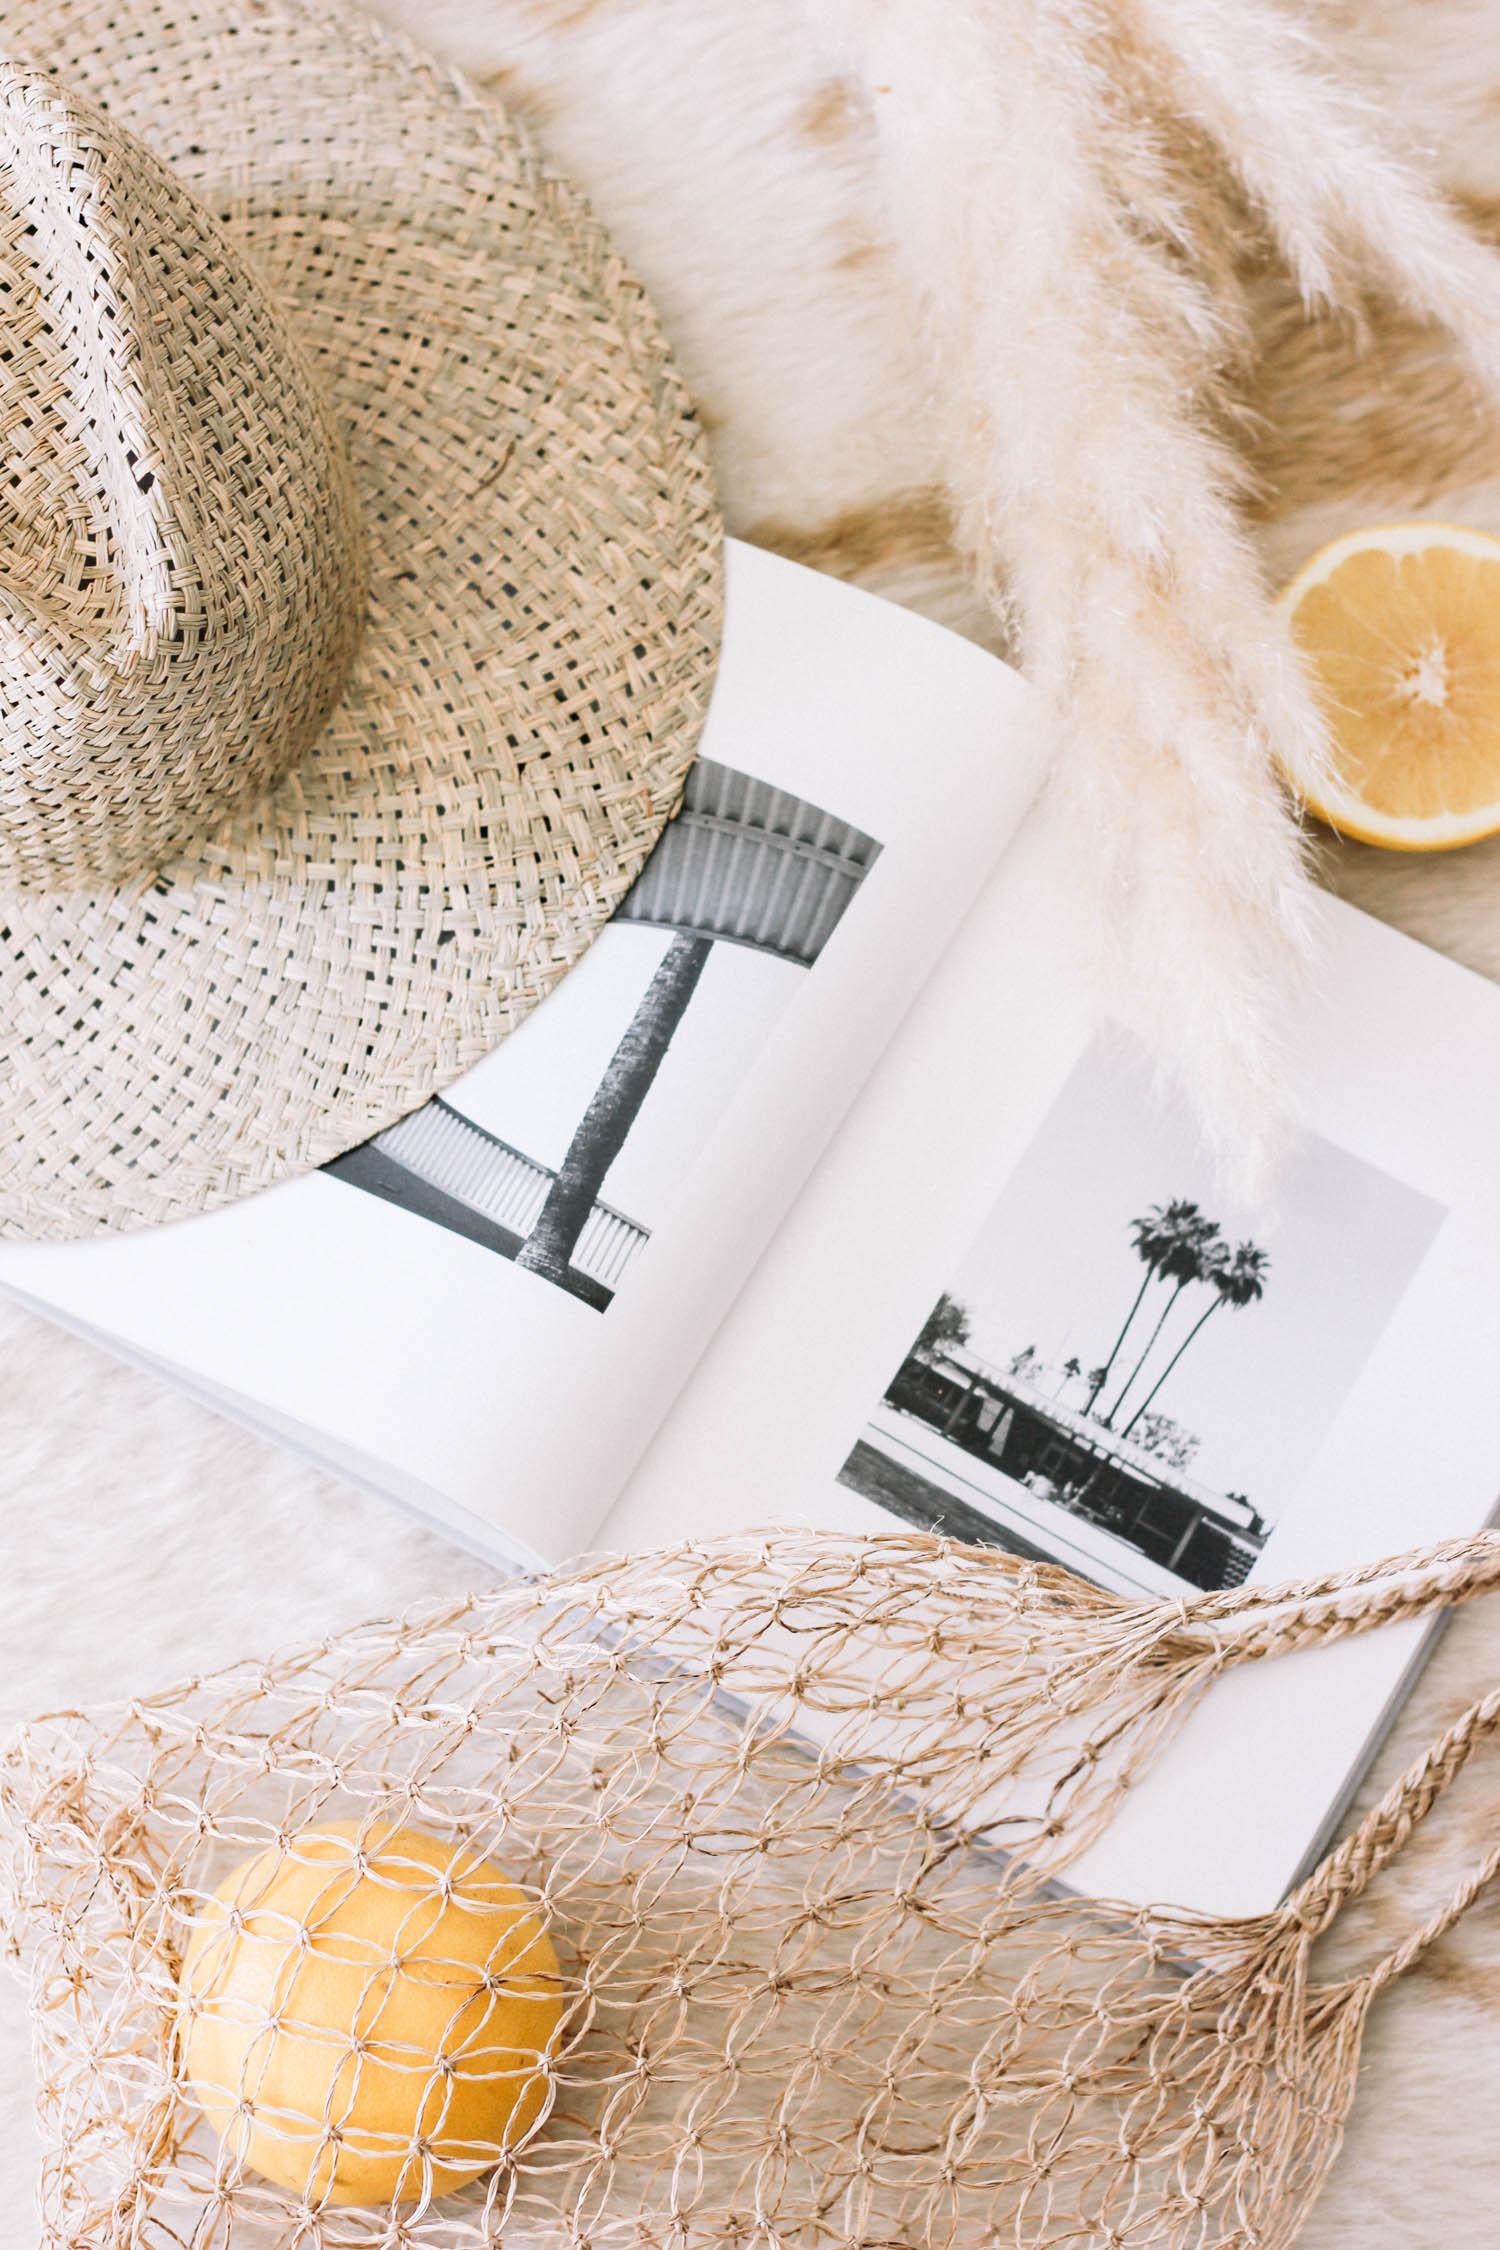 Recent Summer Finds | A Fabulous Fete